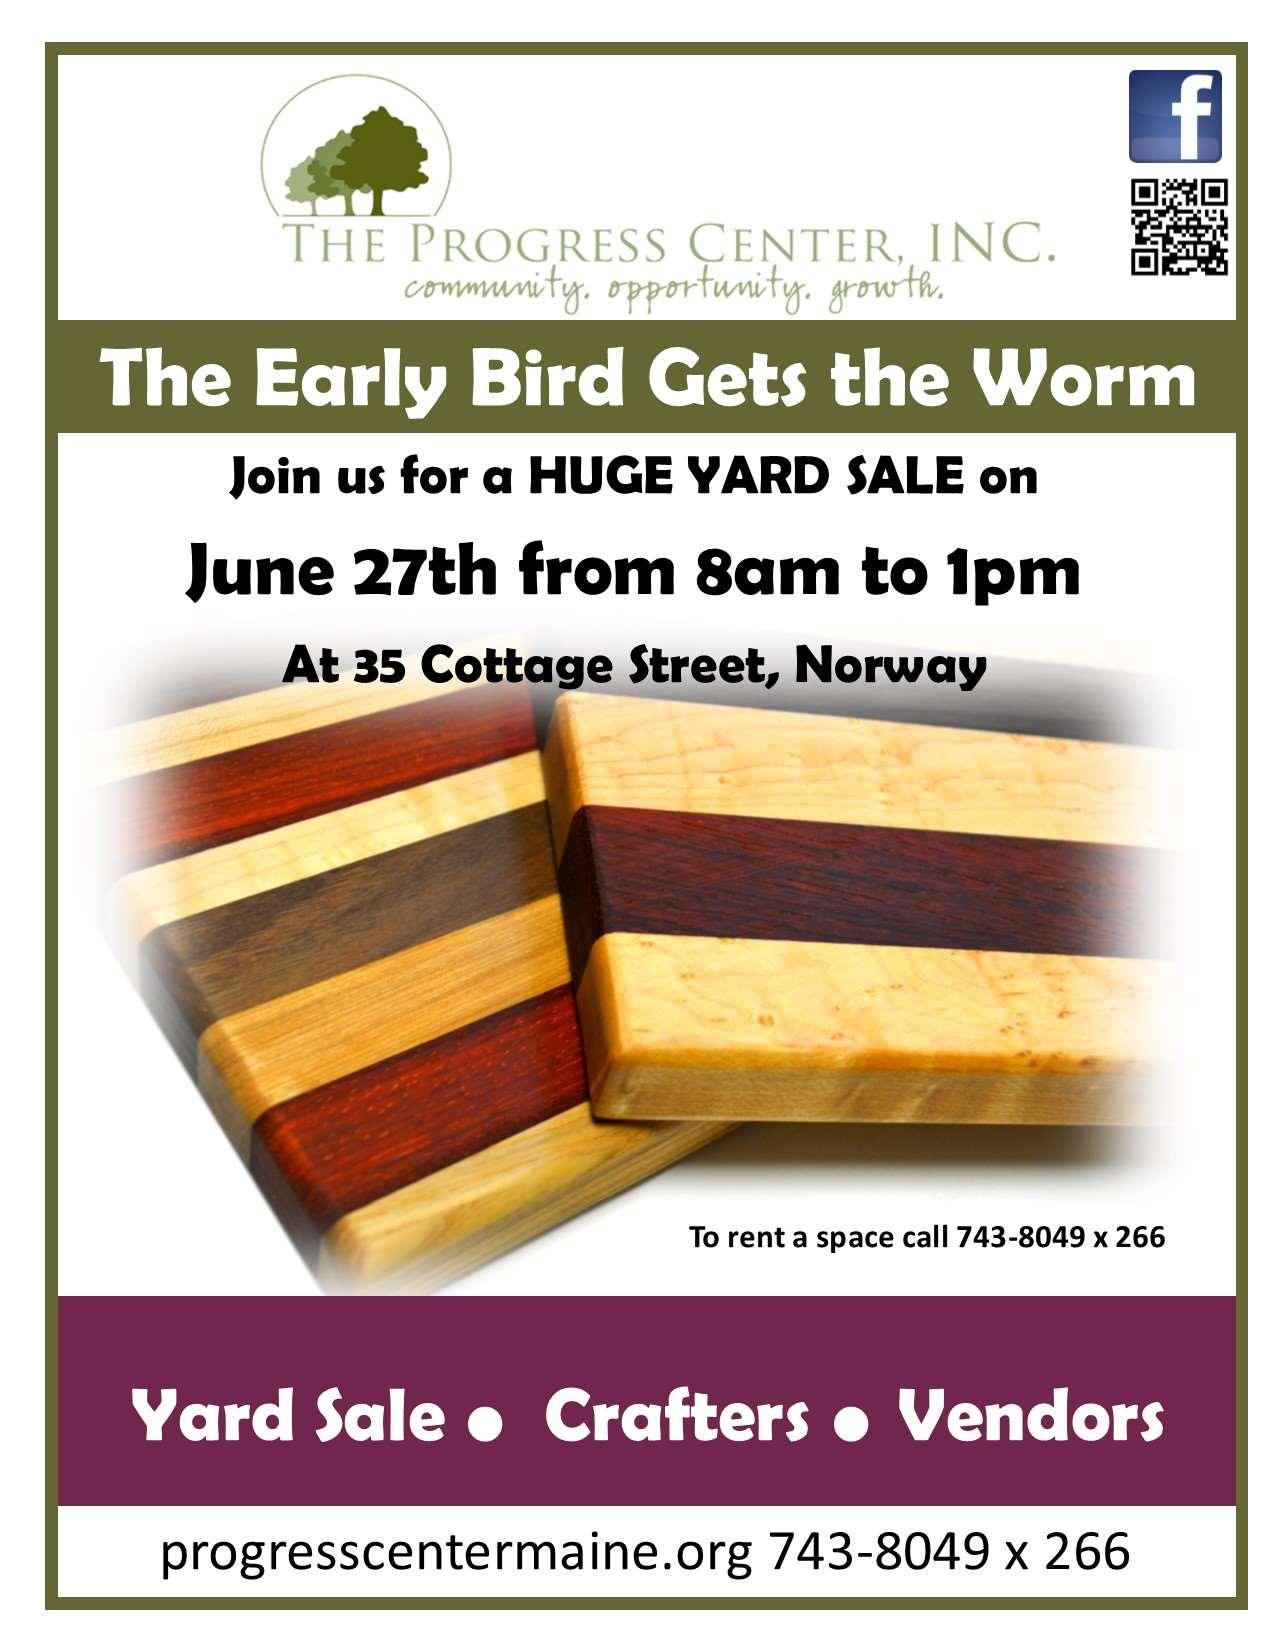 2015 Yard Sale Event flyer